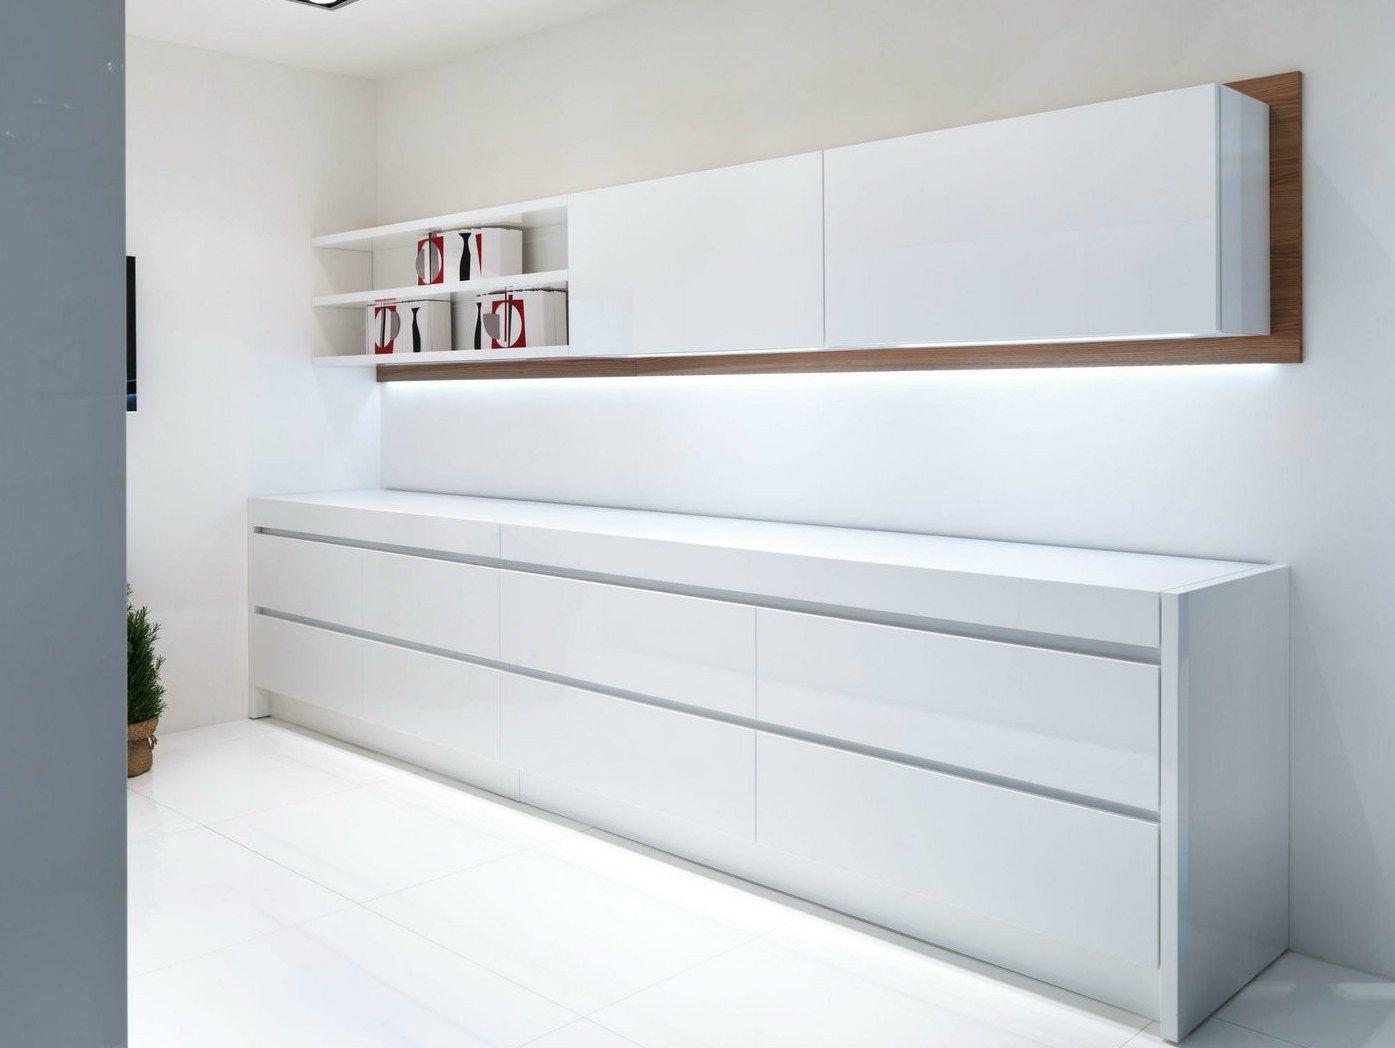 Küchenmöbel edelstahl: edelstahl kuche abimis design ...